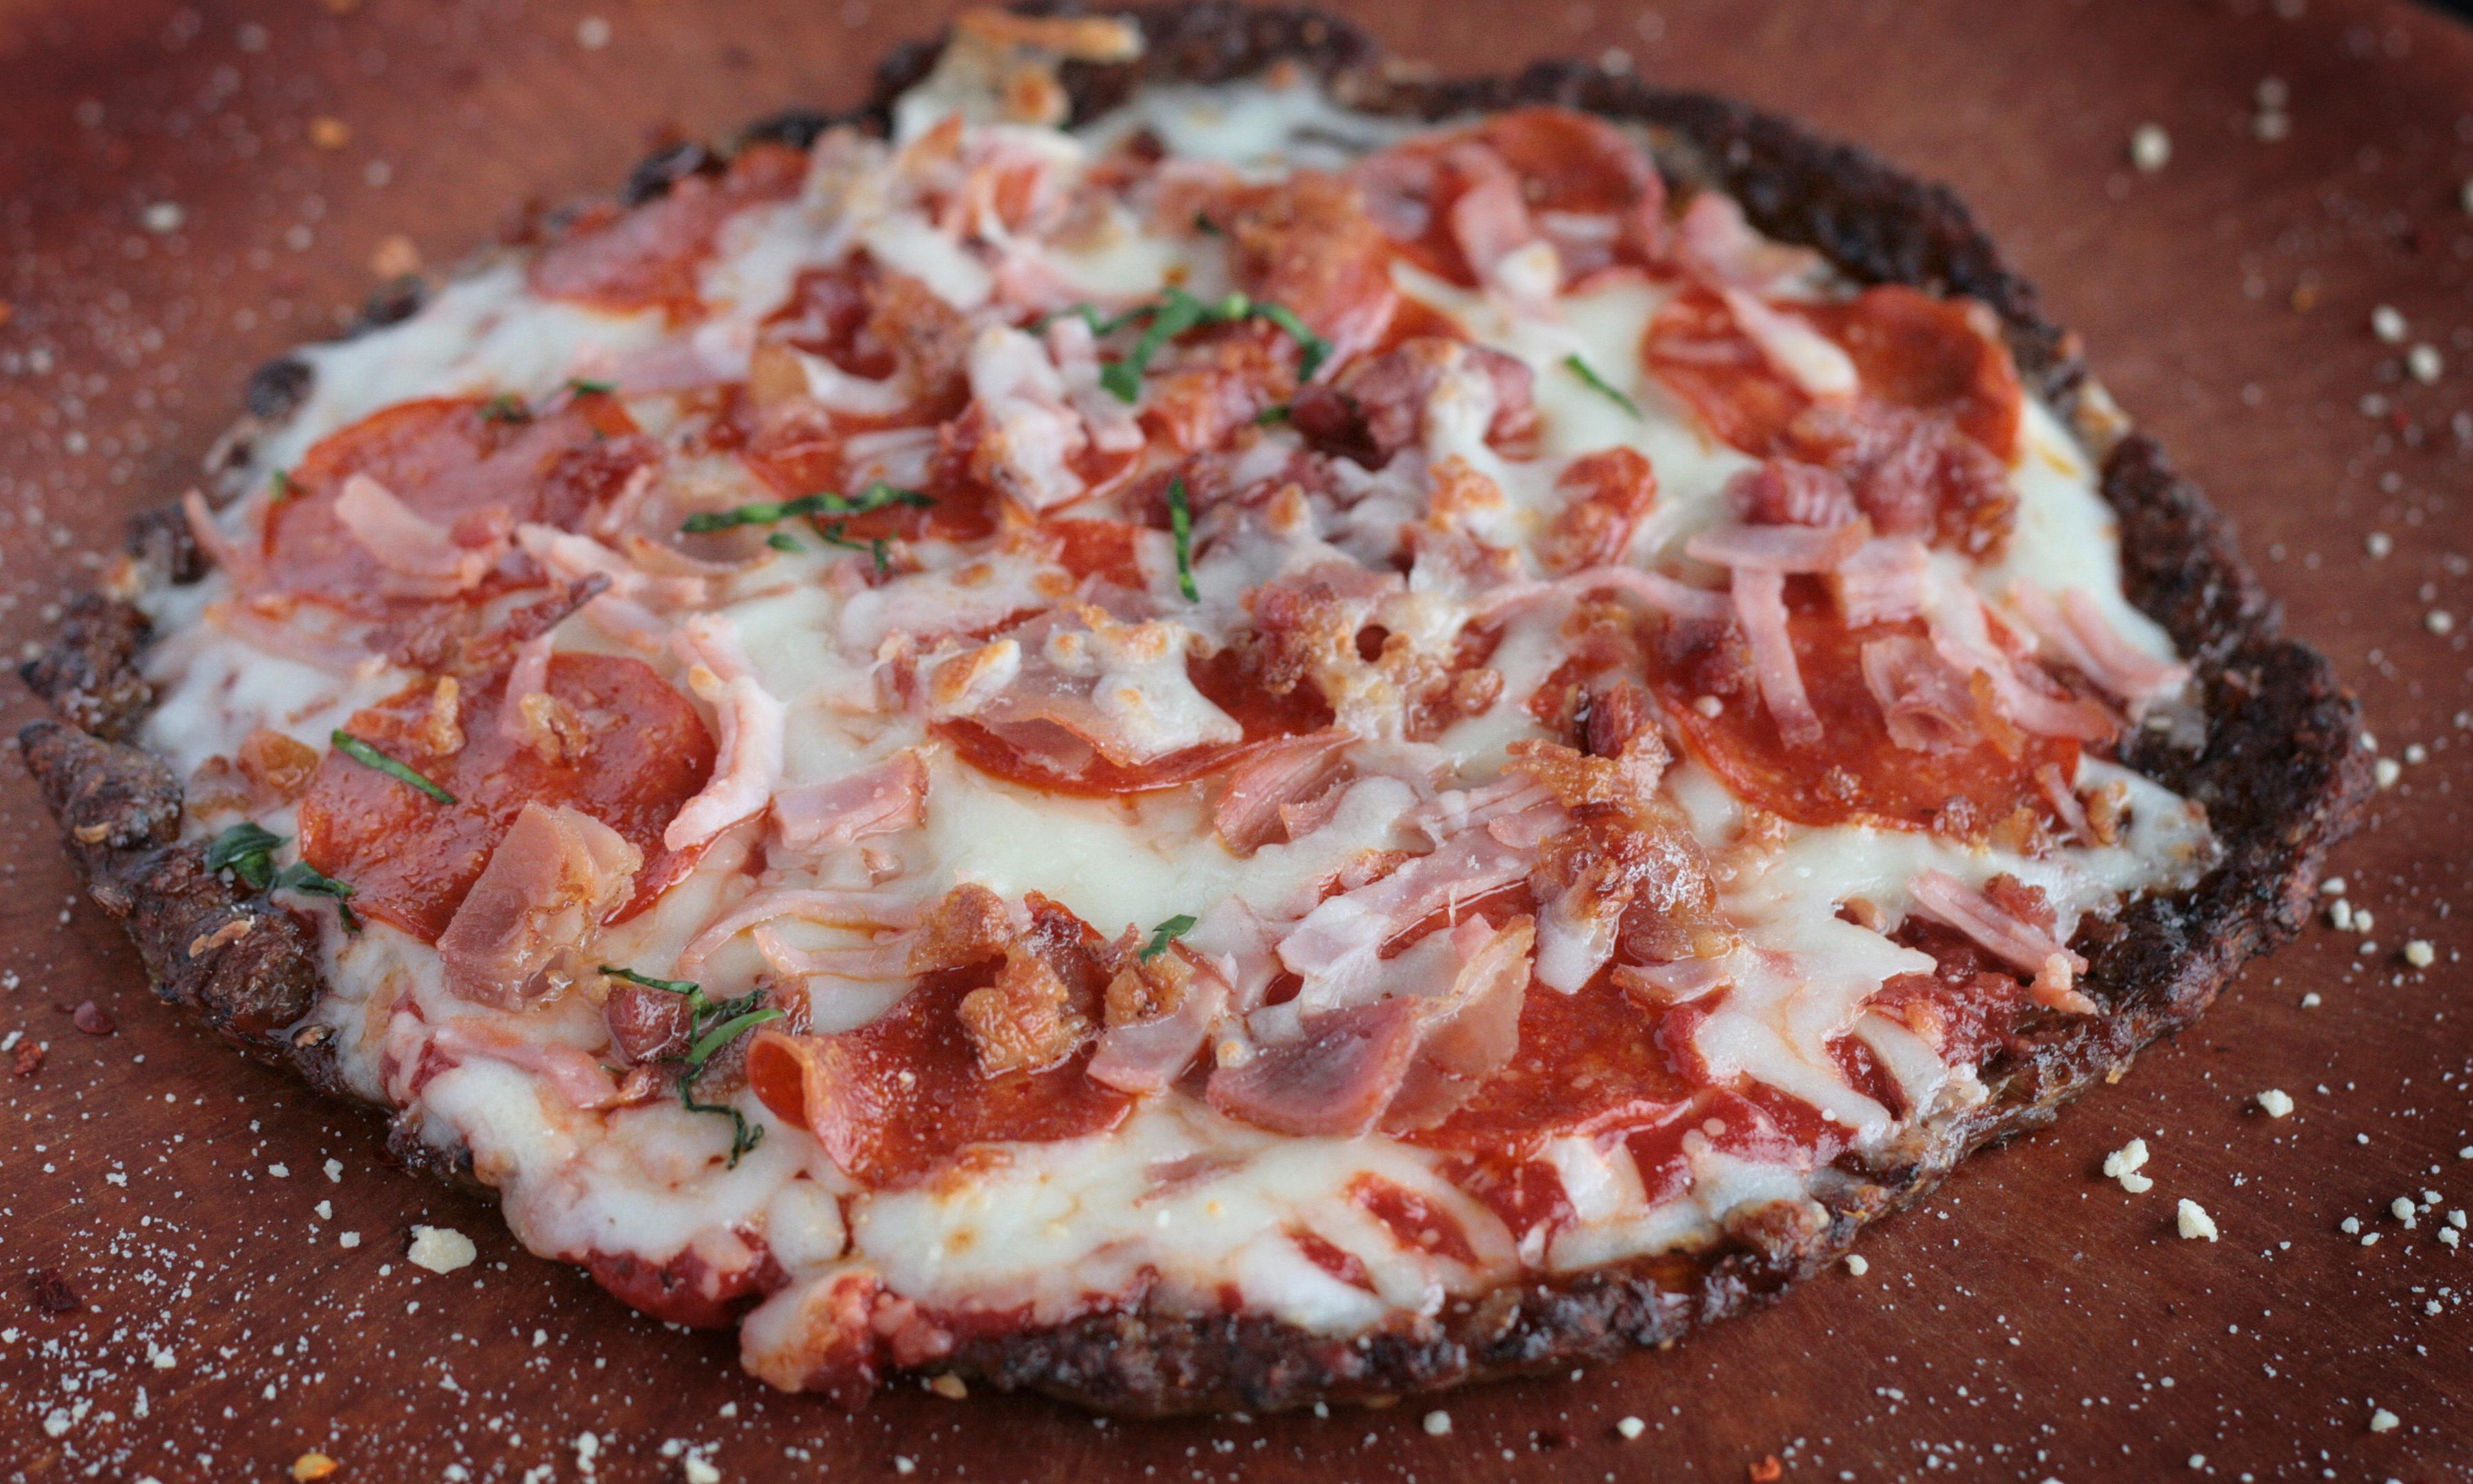 Carnivore Sausage Crust 2